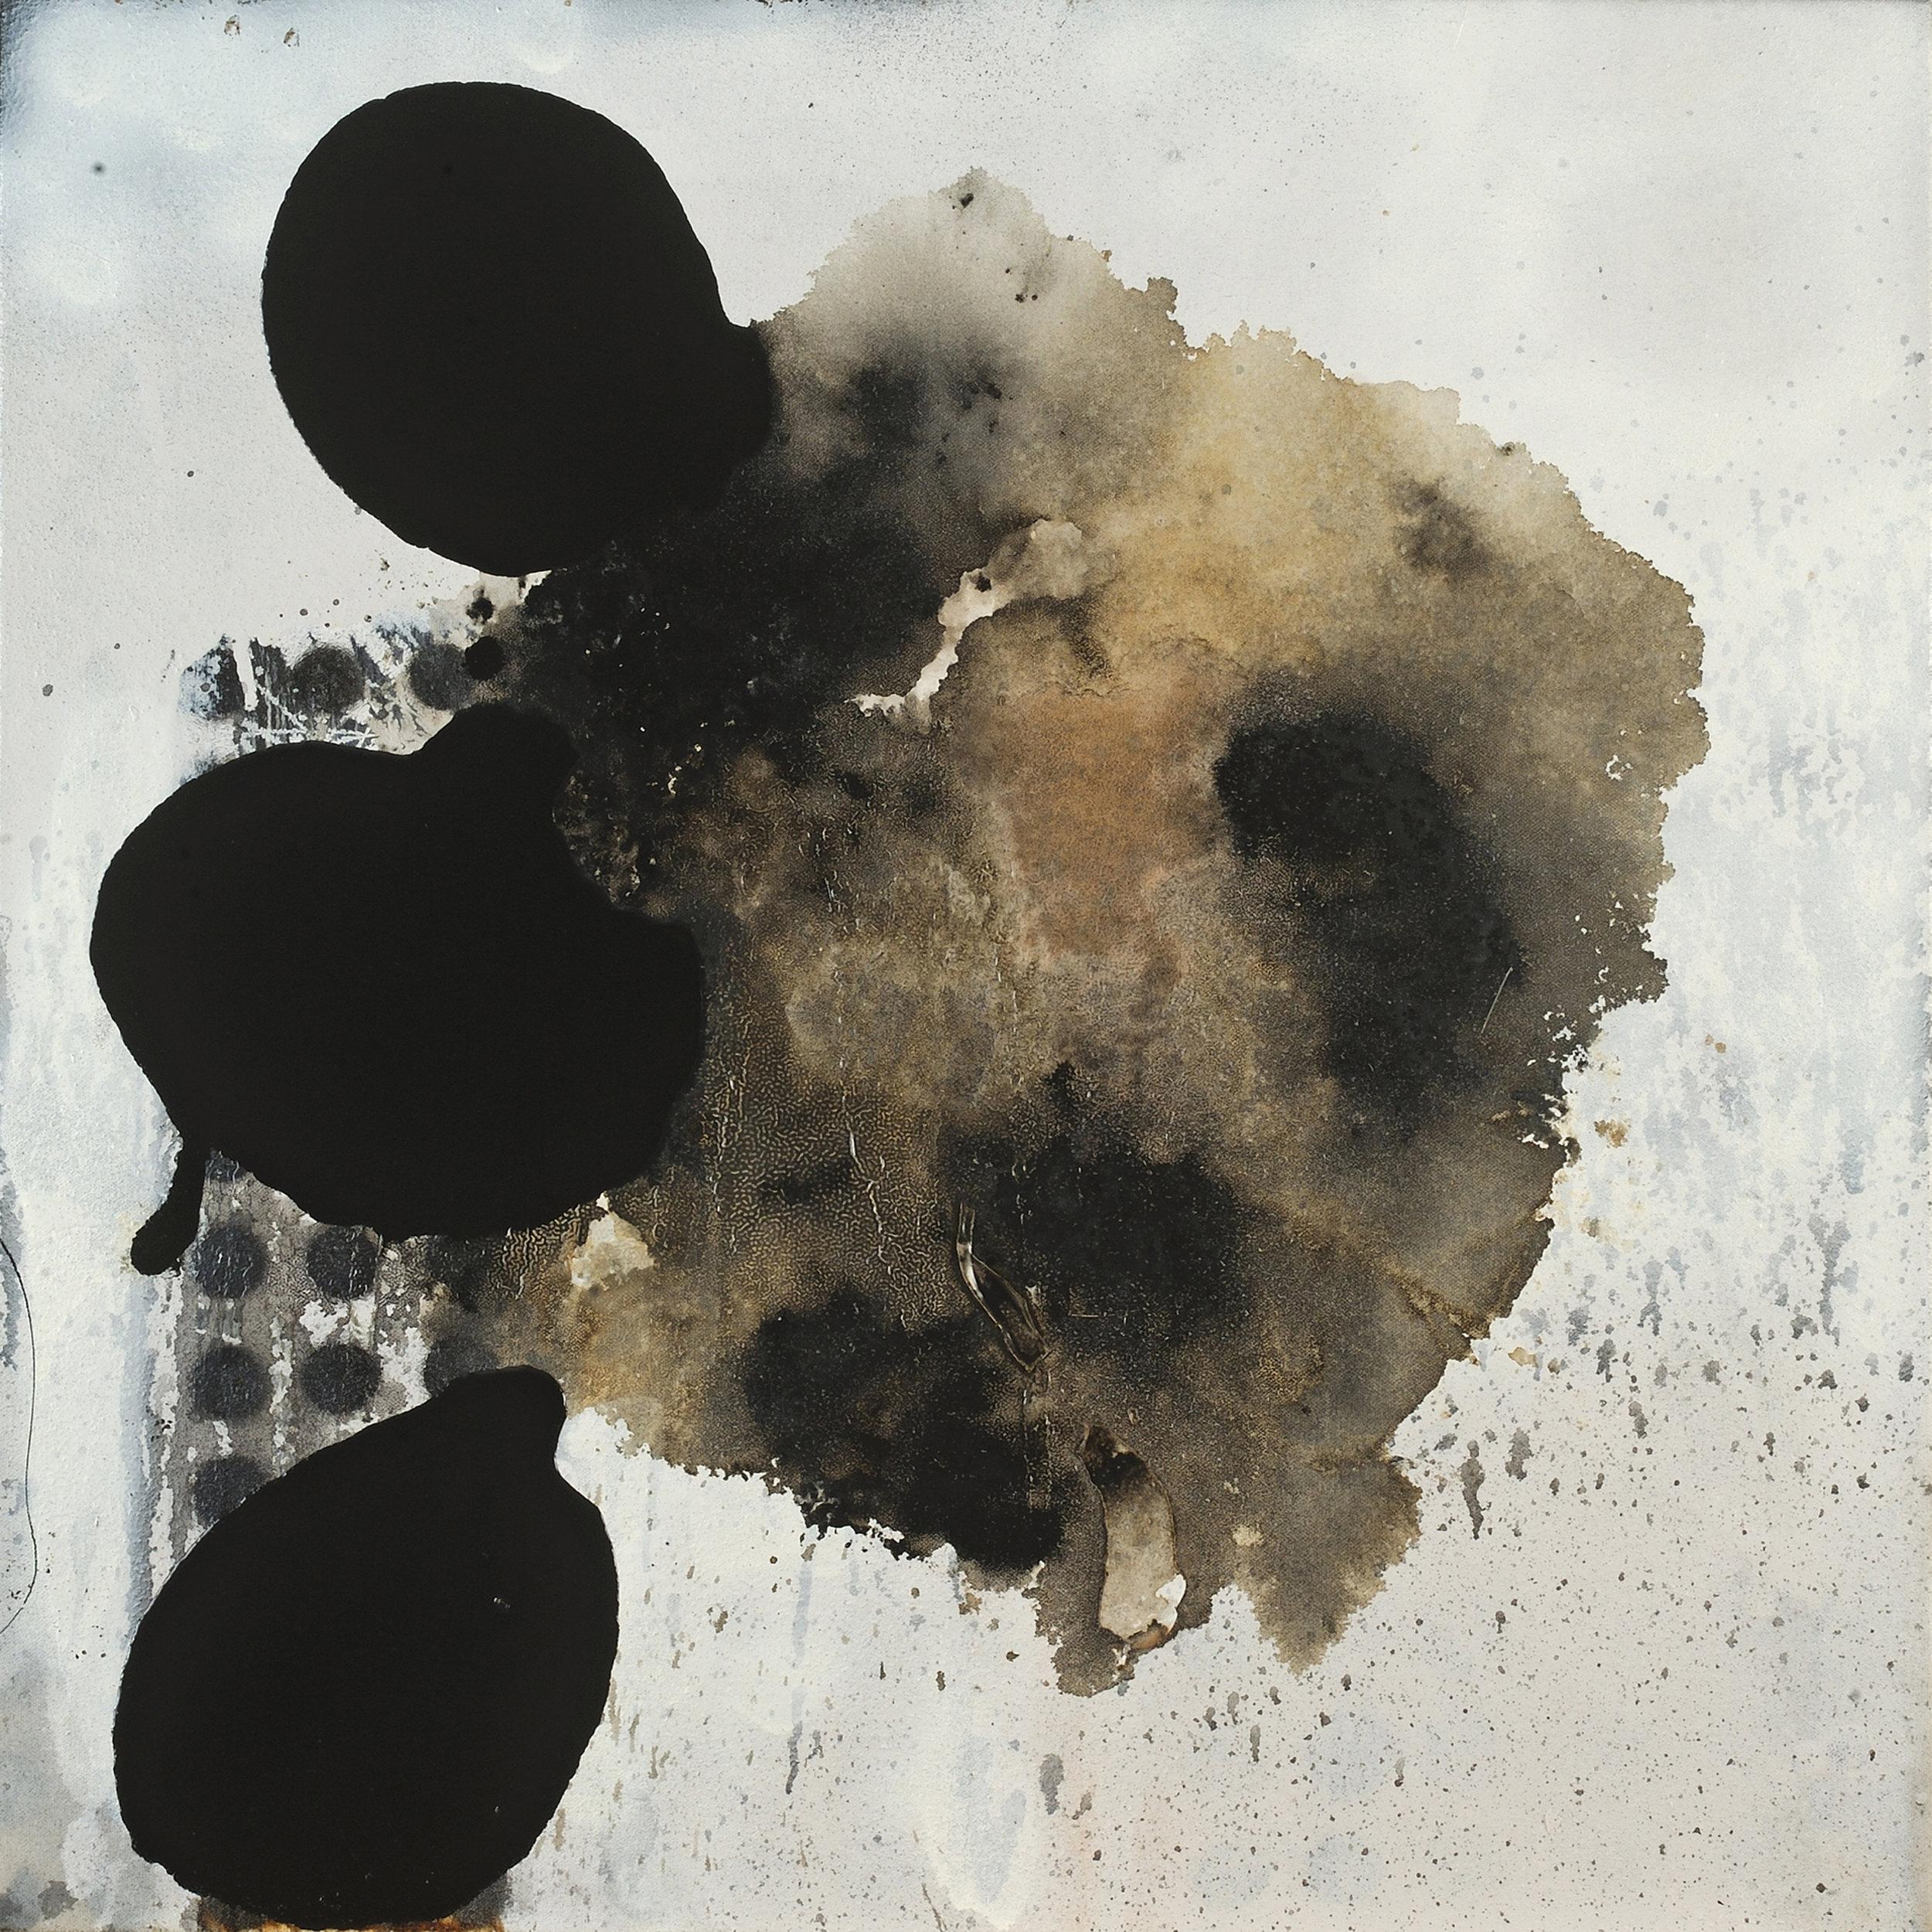 "Zina-Marina   oil, enamel, bitumen, aerosol and debris on canvas  23.75"" x 23.75""  2016"